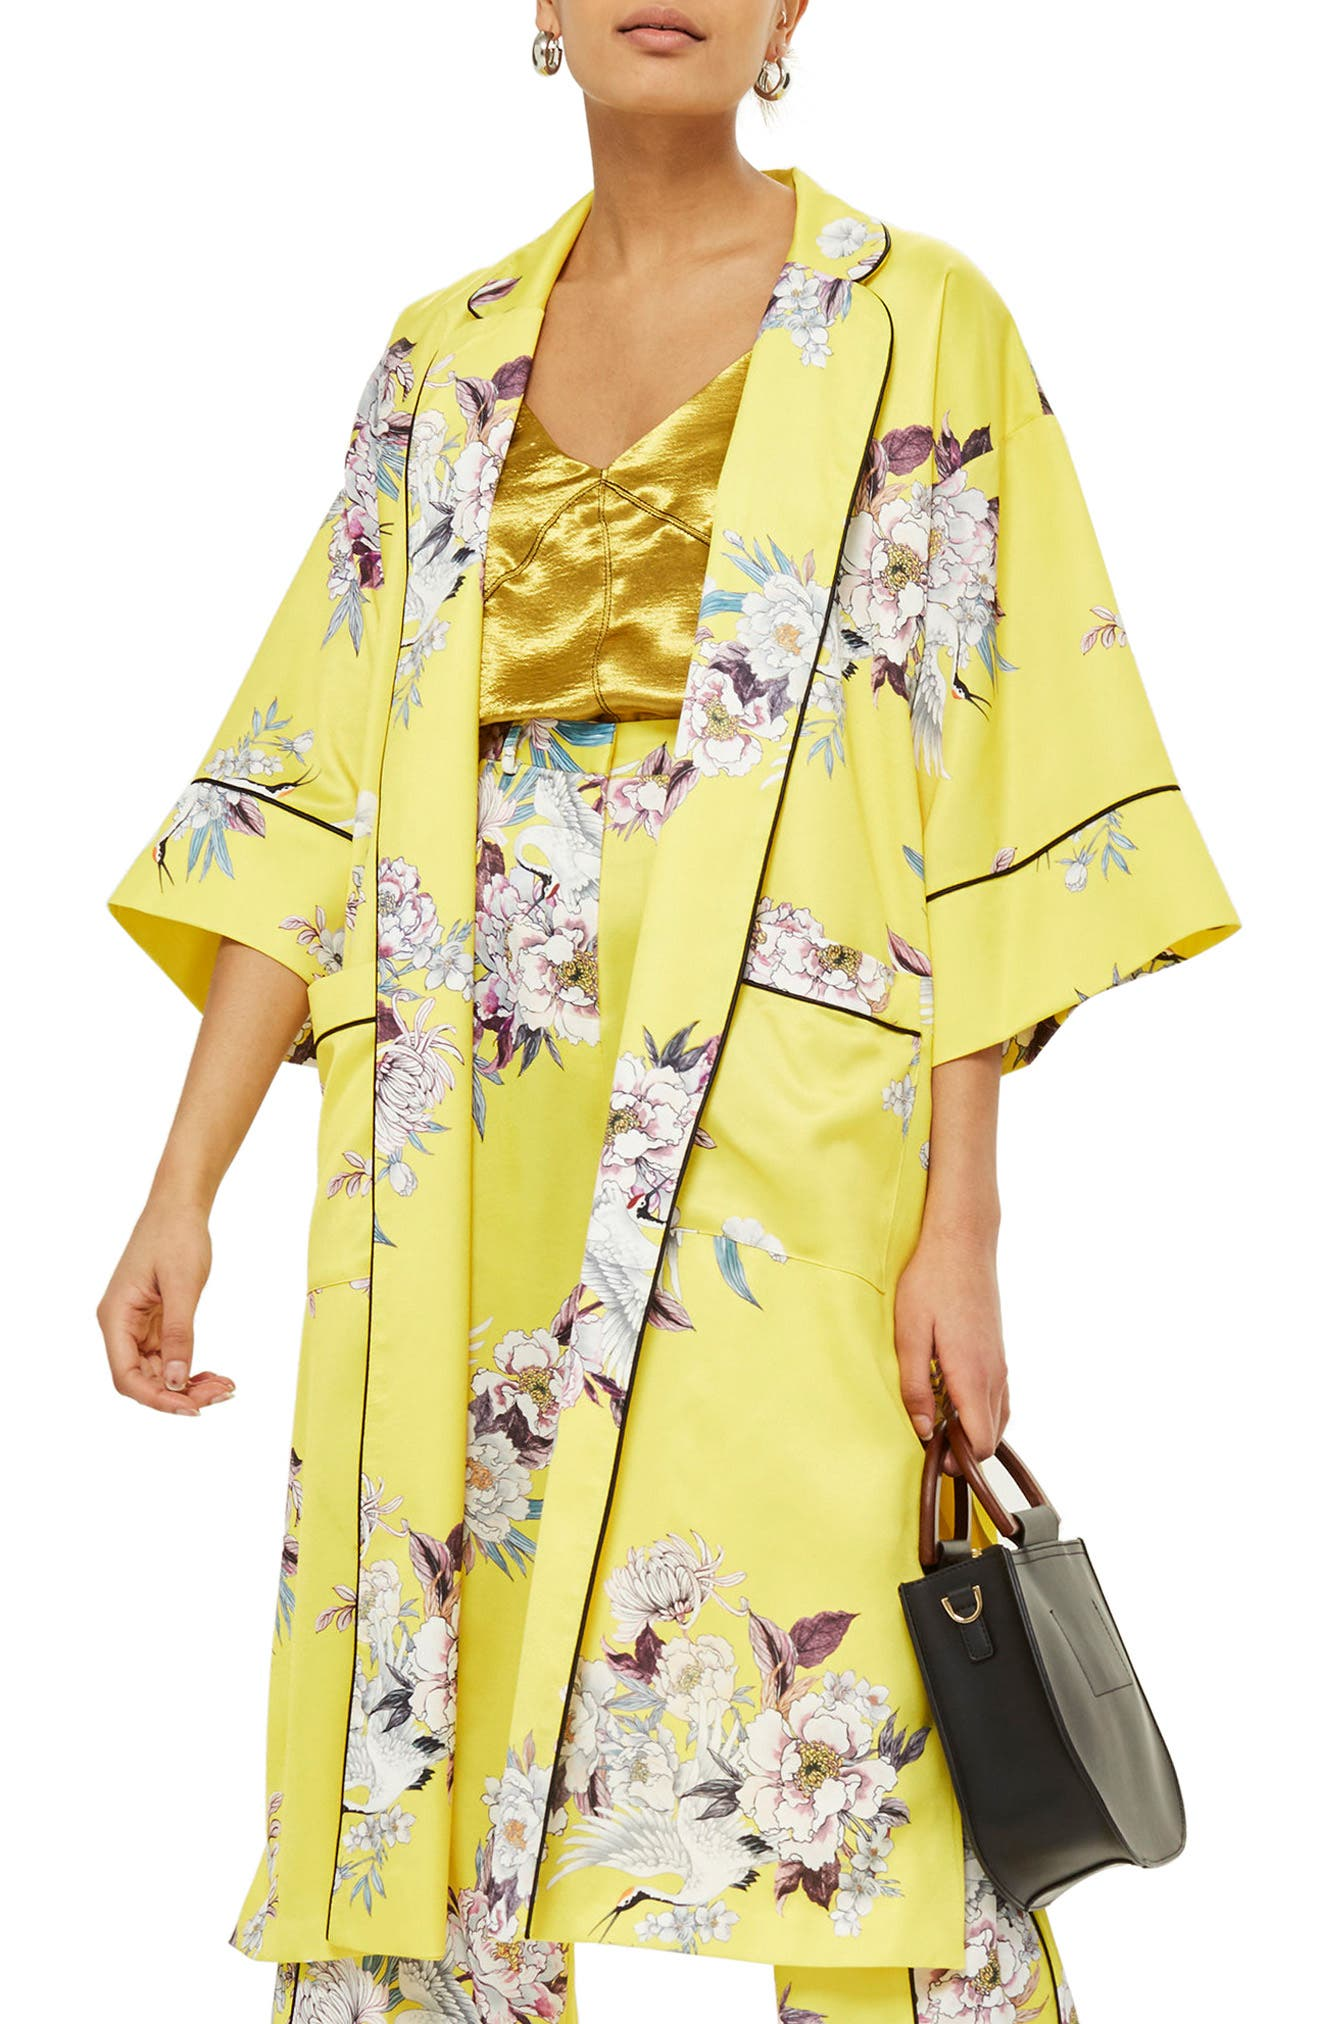 Heron Print Kimono,                         Main,                         color,